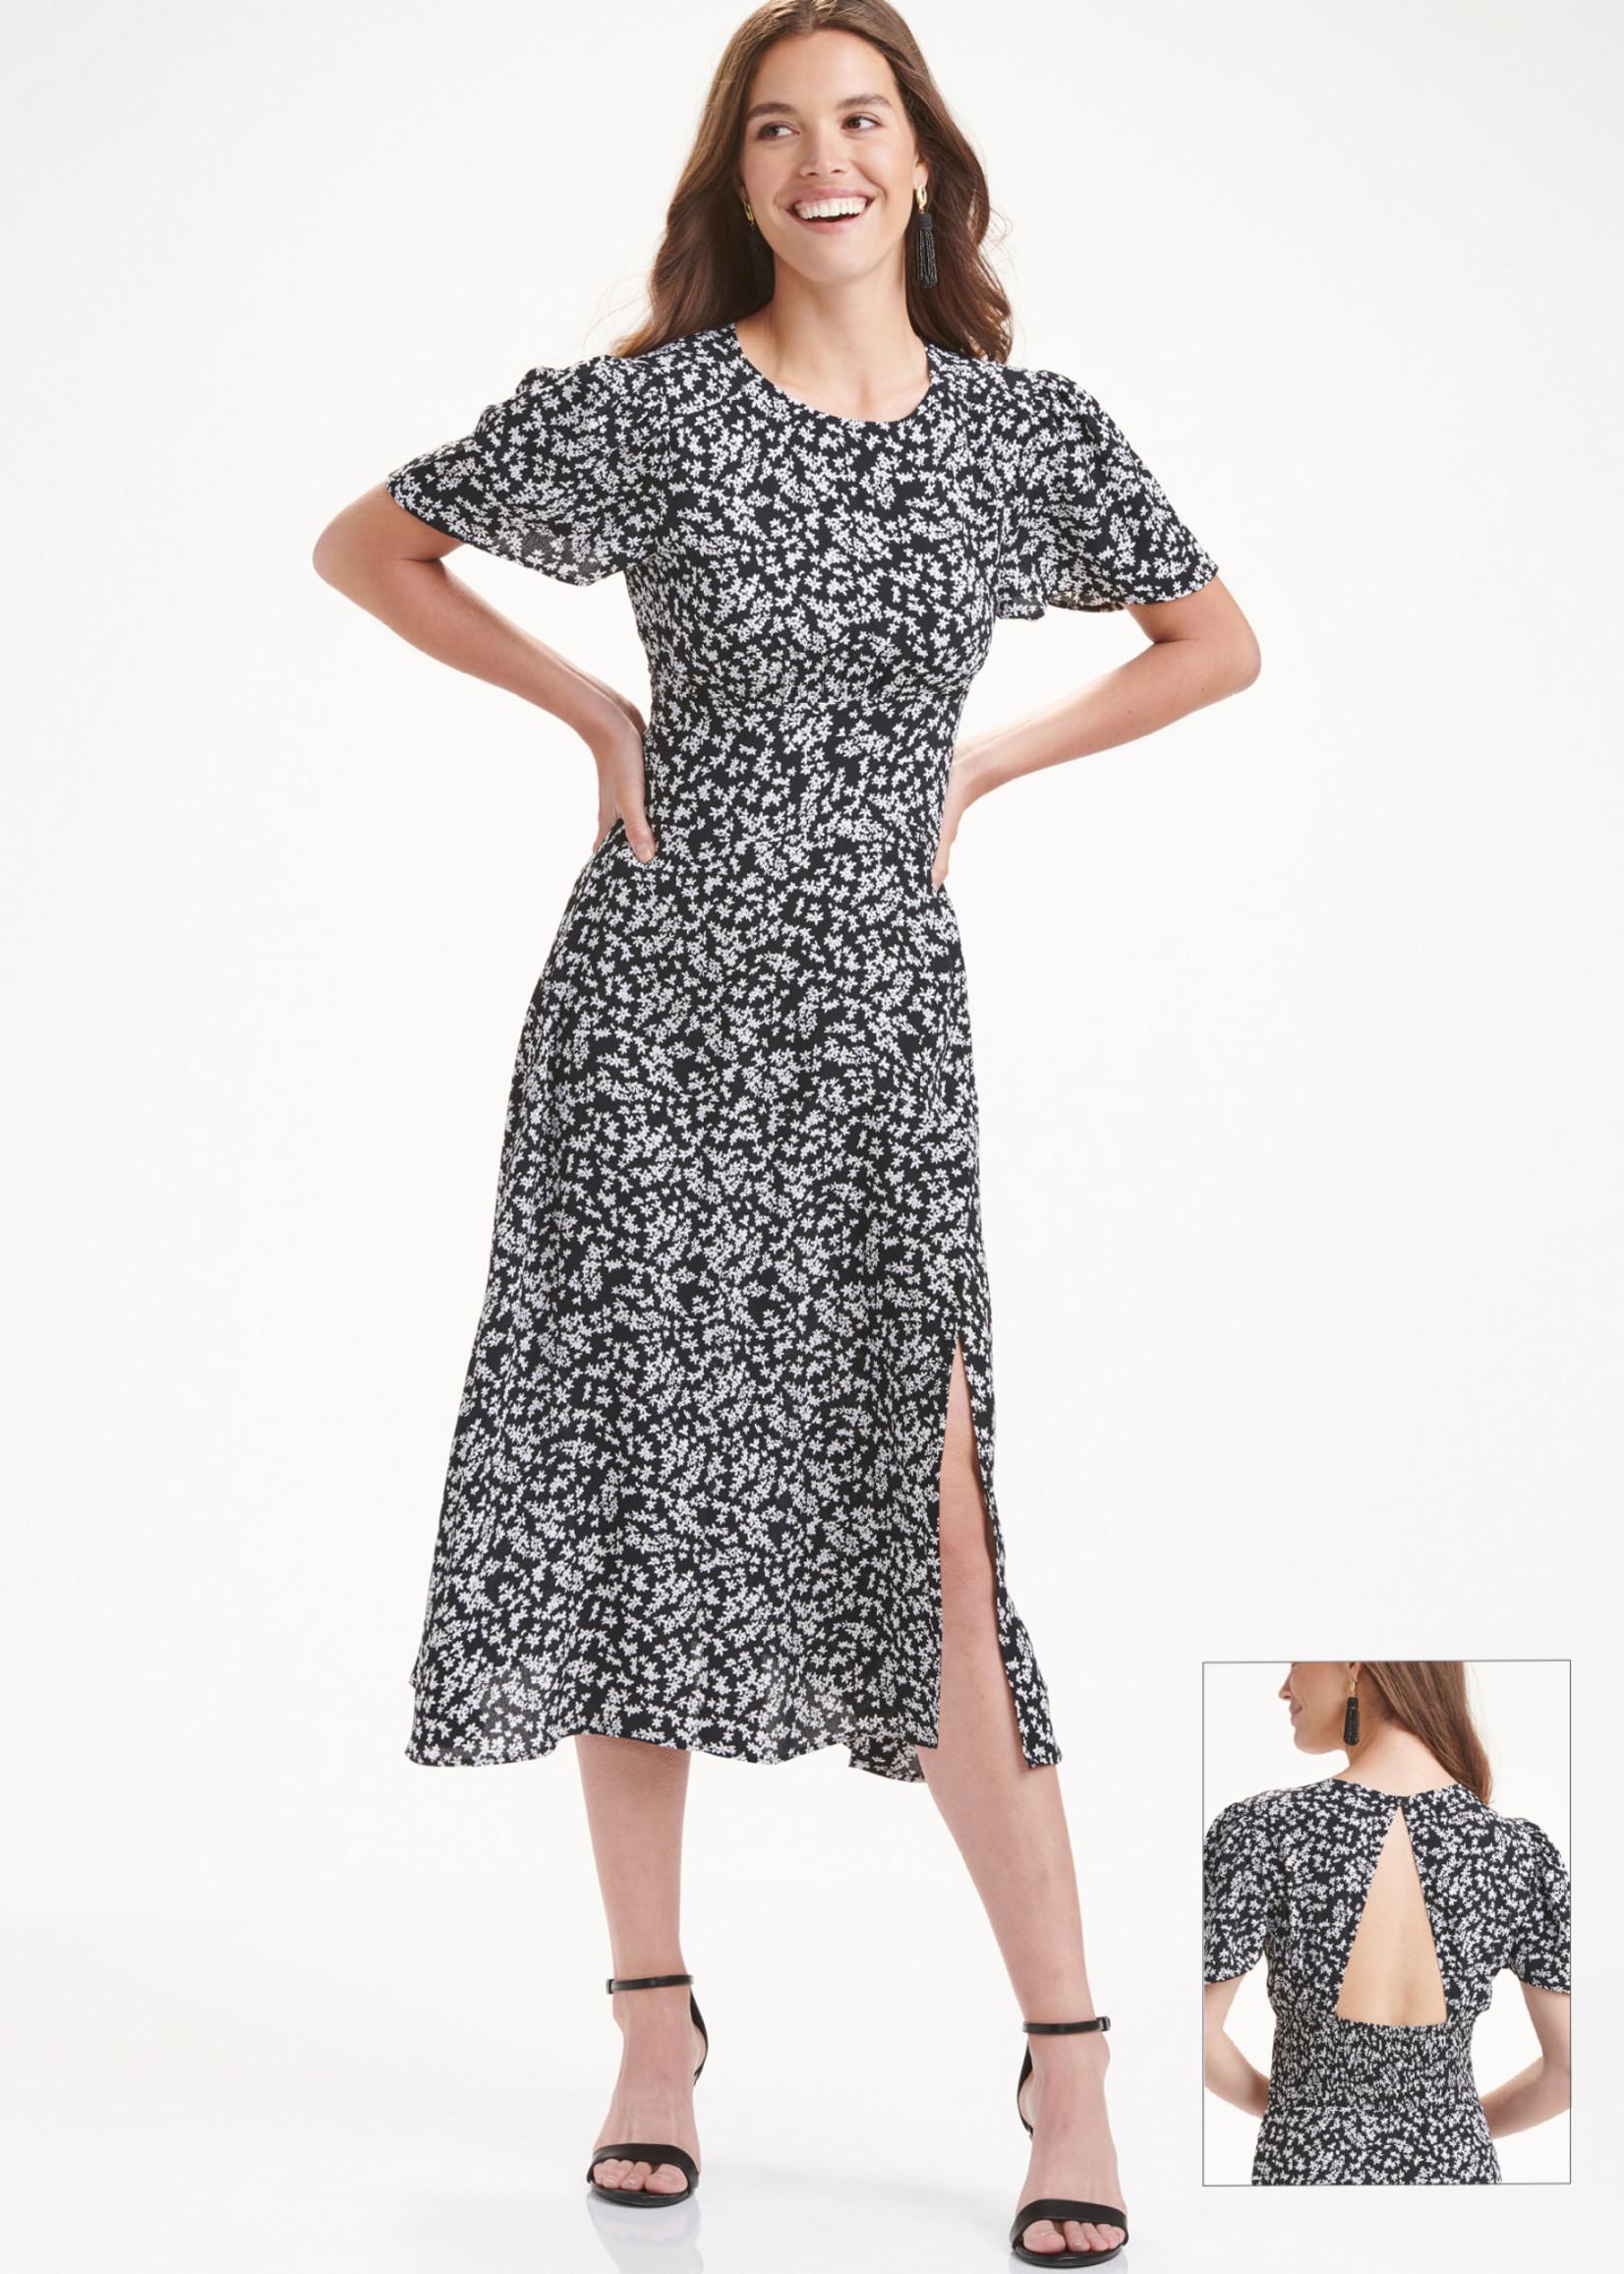 Charlie Paige CP - Floral Print Dress